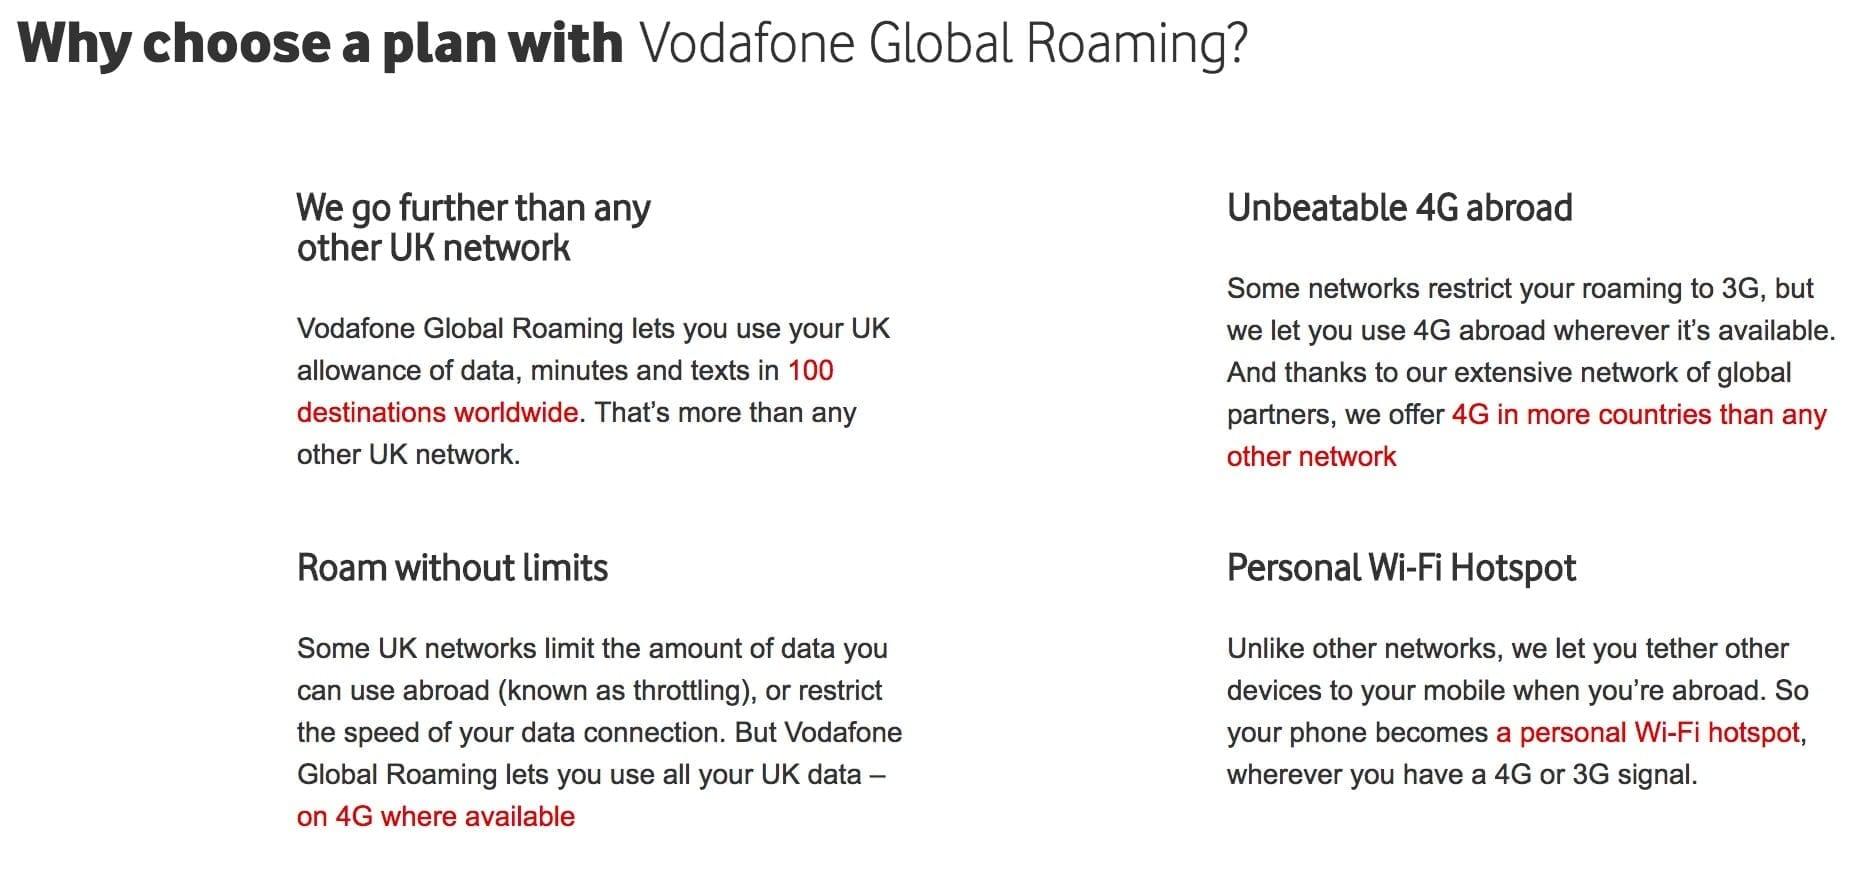 Vodafone explains its benefits